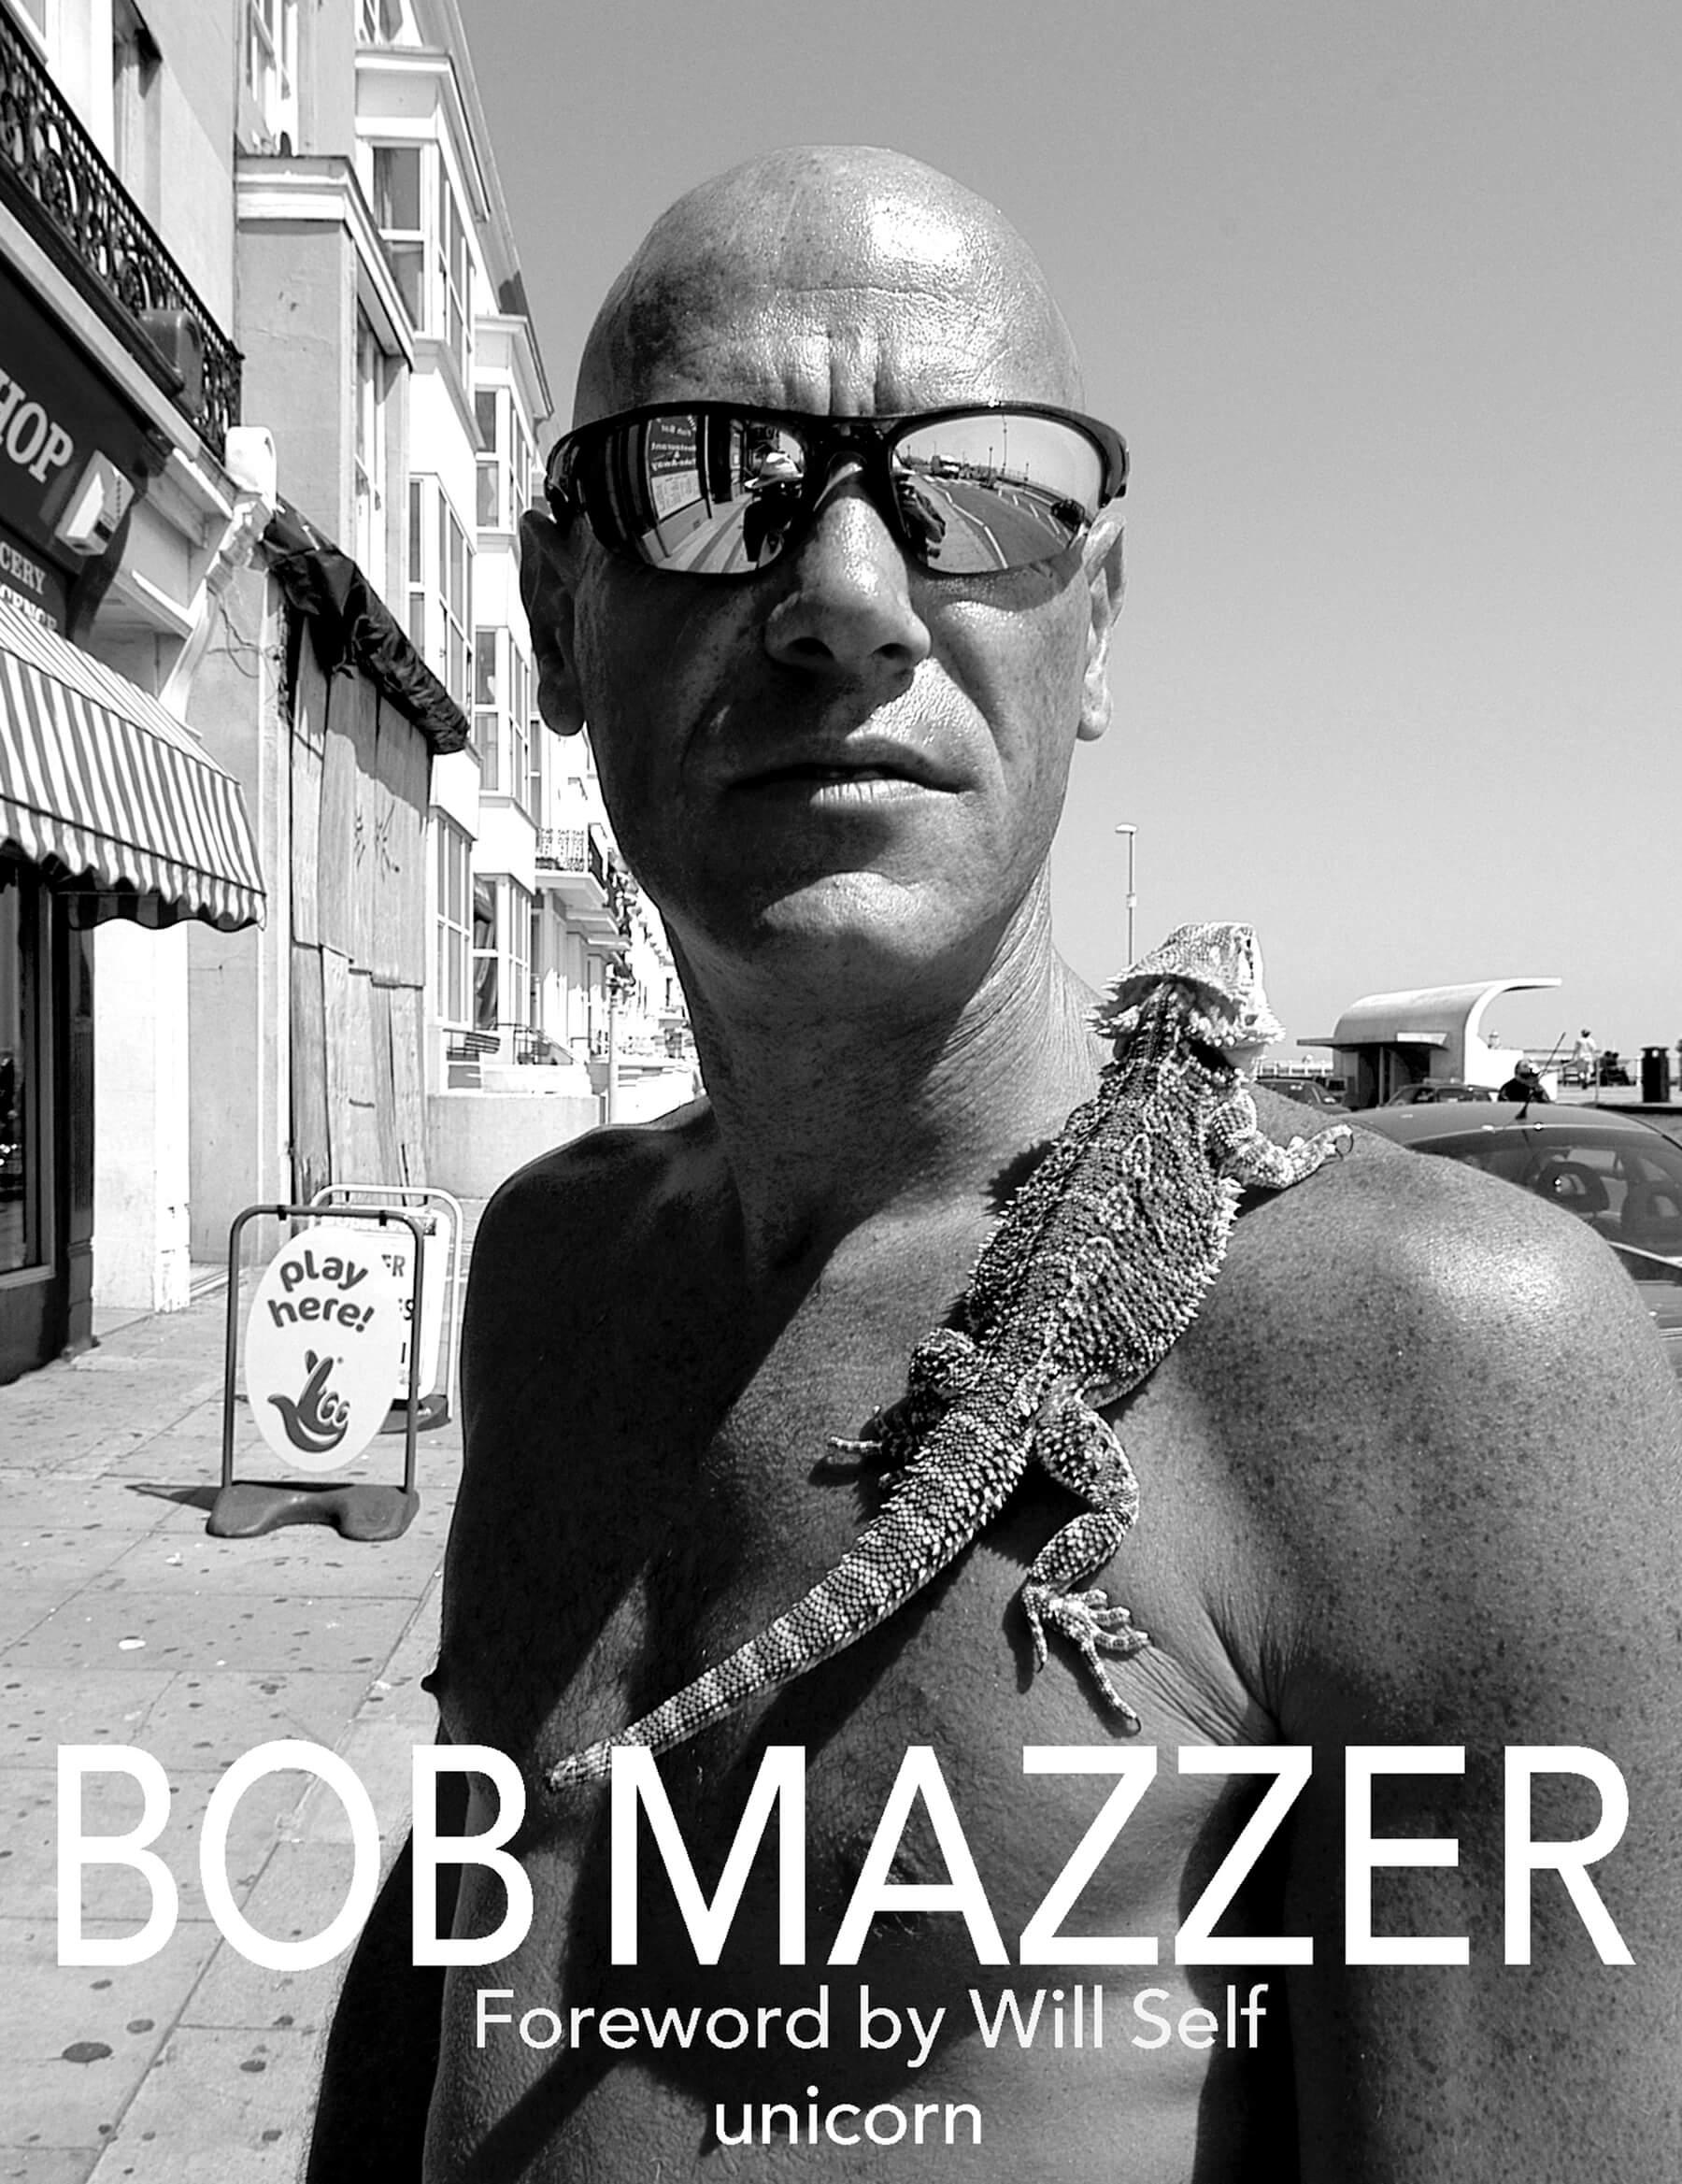 BOB MAZZER photobook